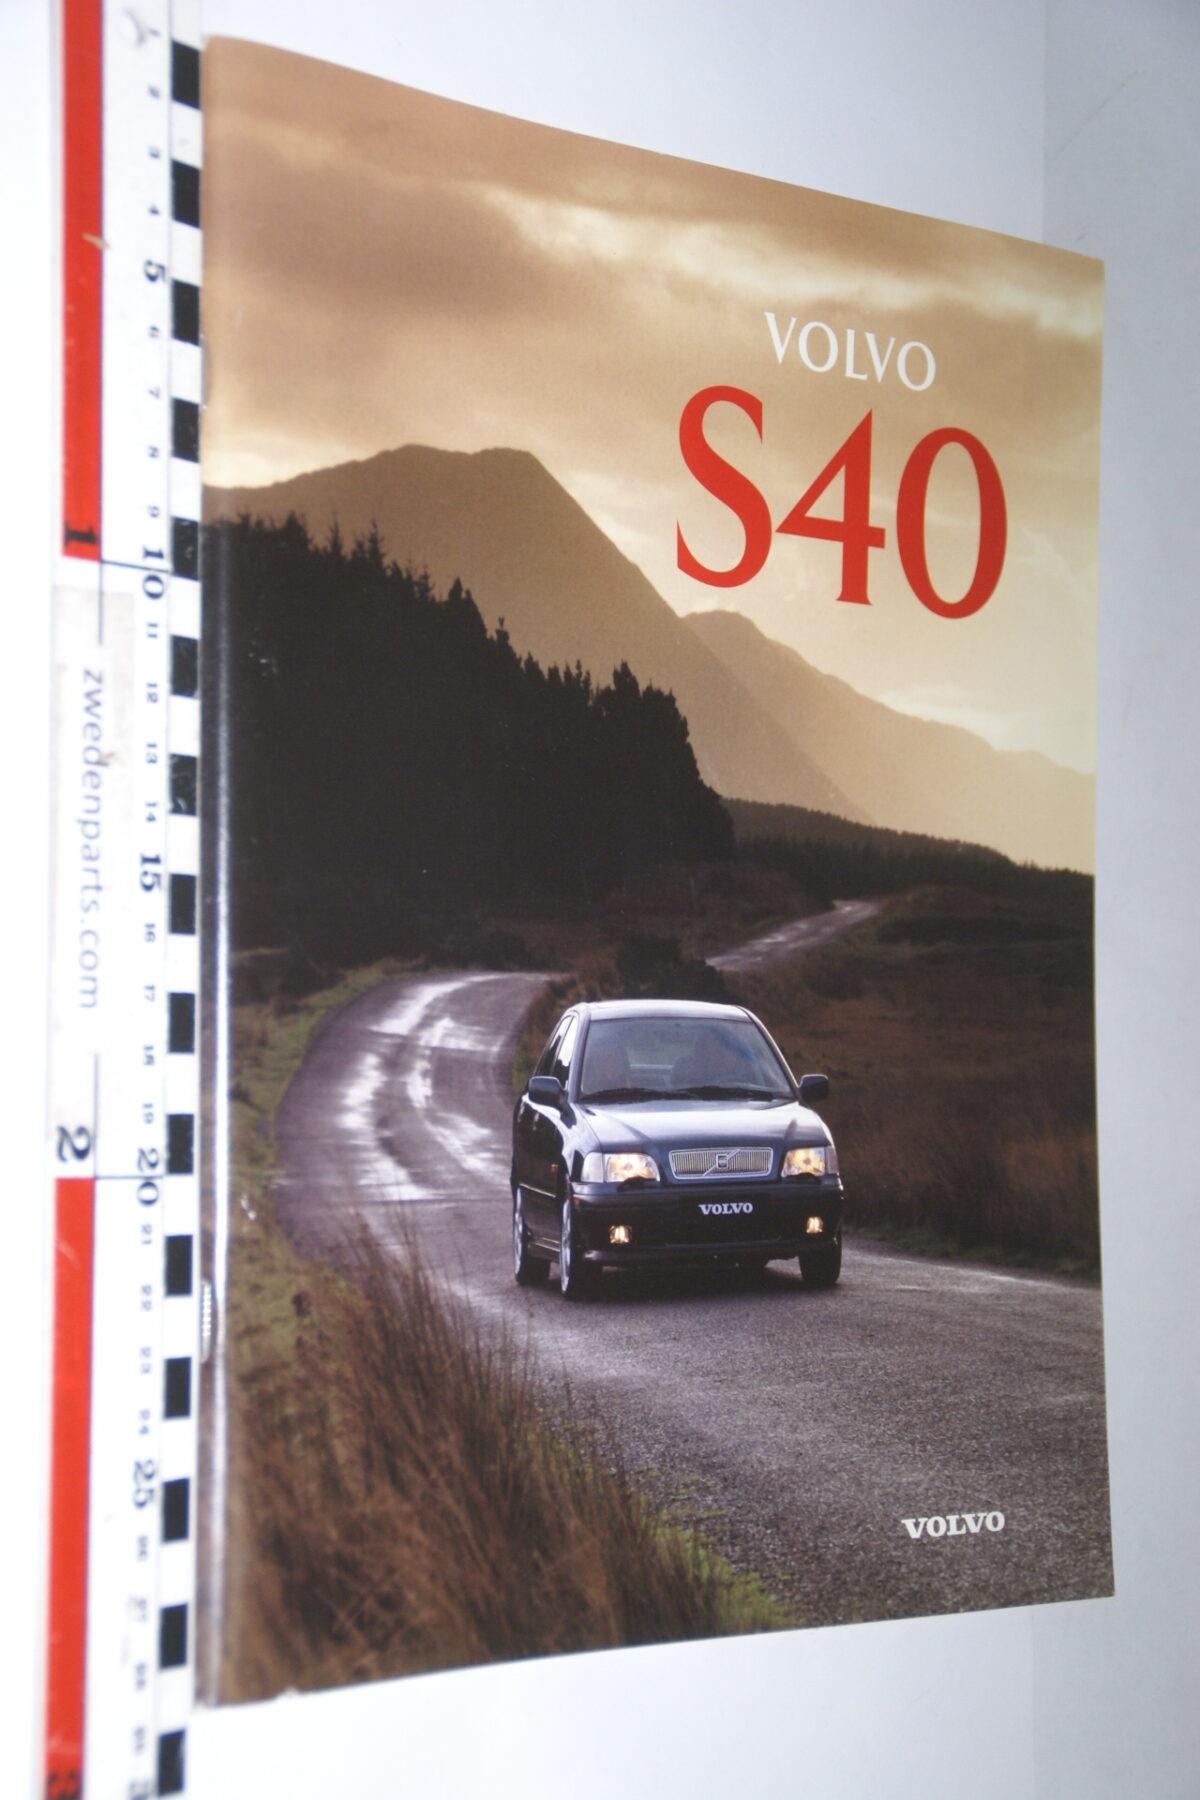 DSC04739 1996 originele brochure Volvo S40 nr MSPV 8055-f526b22a